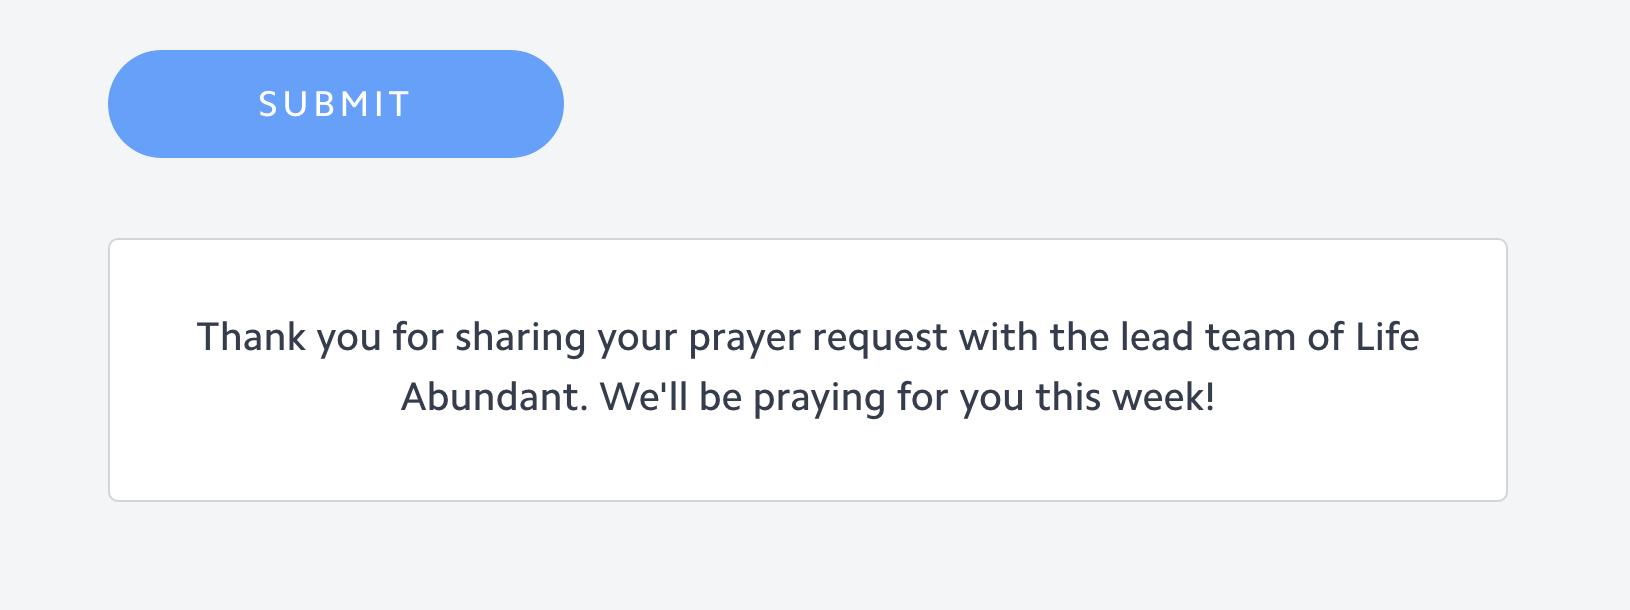 Prayer request confirmation message